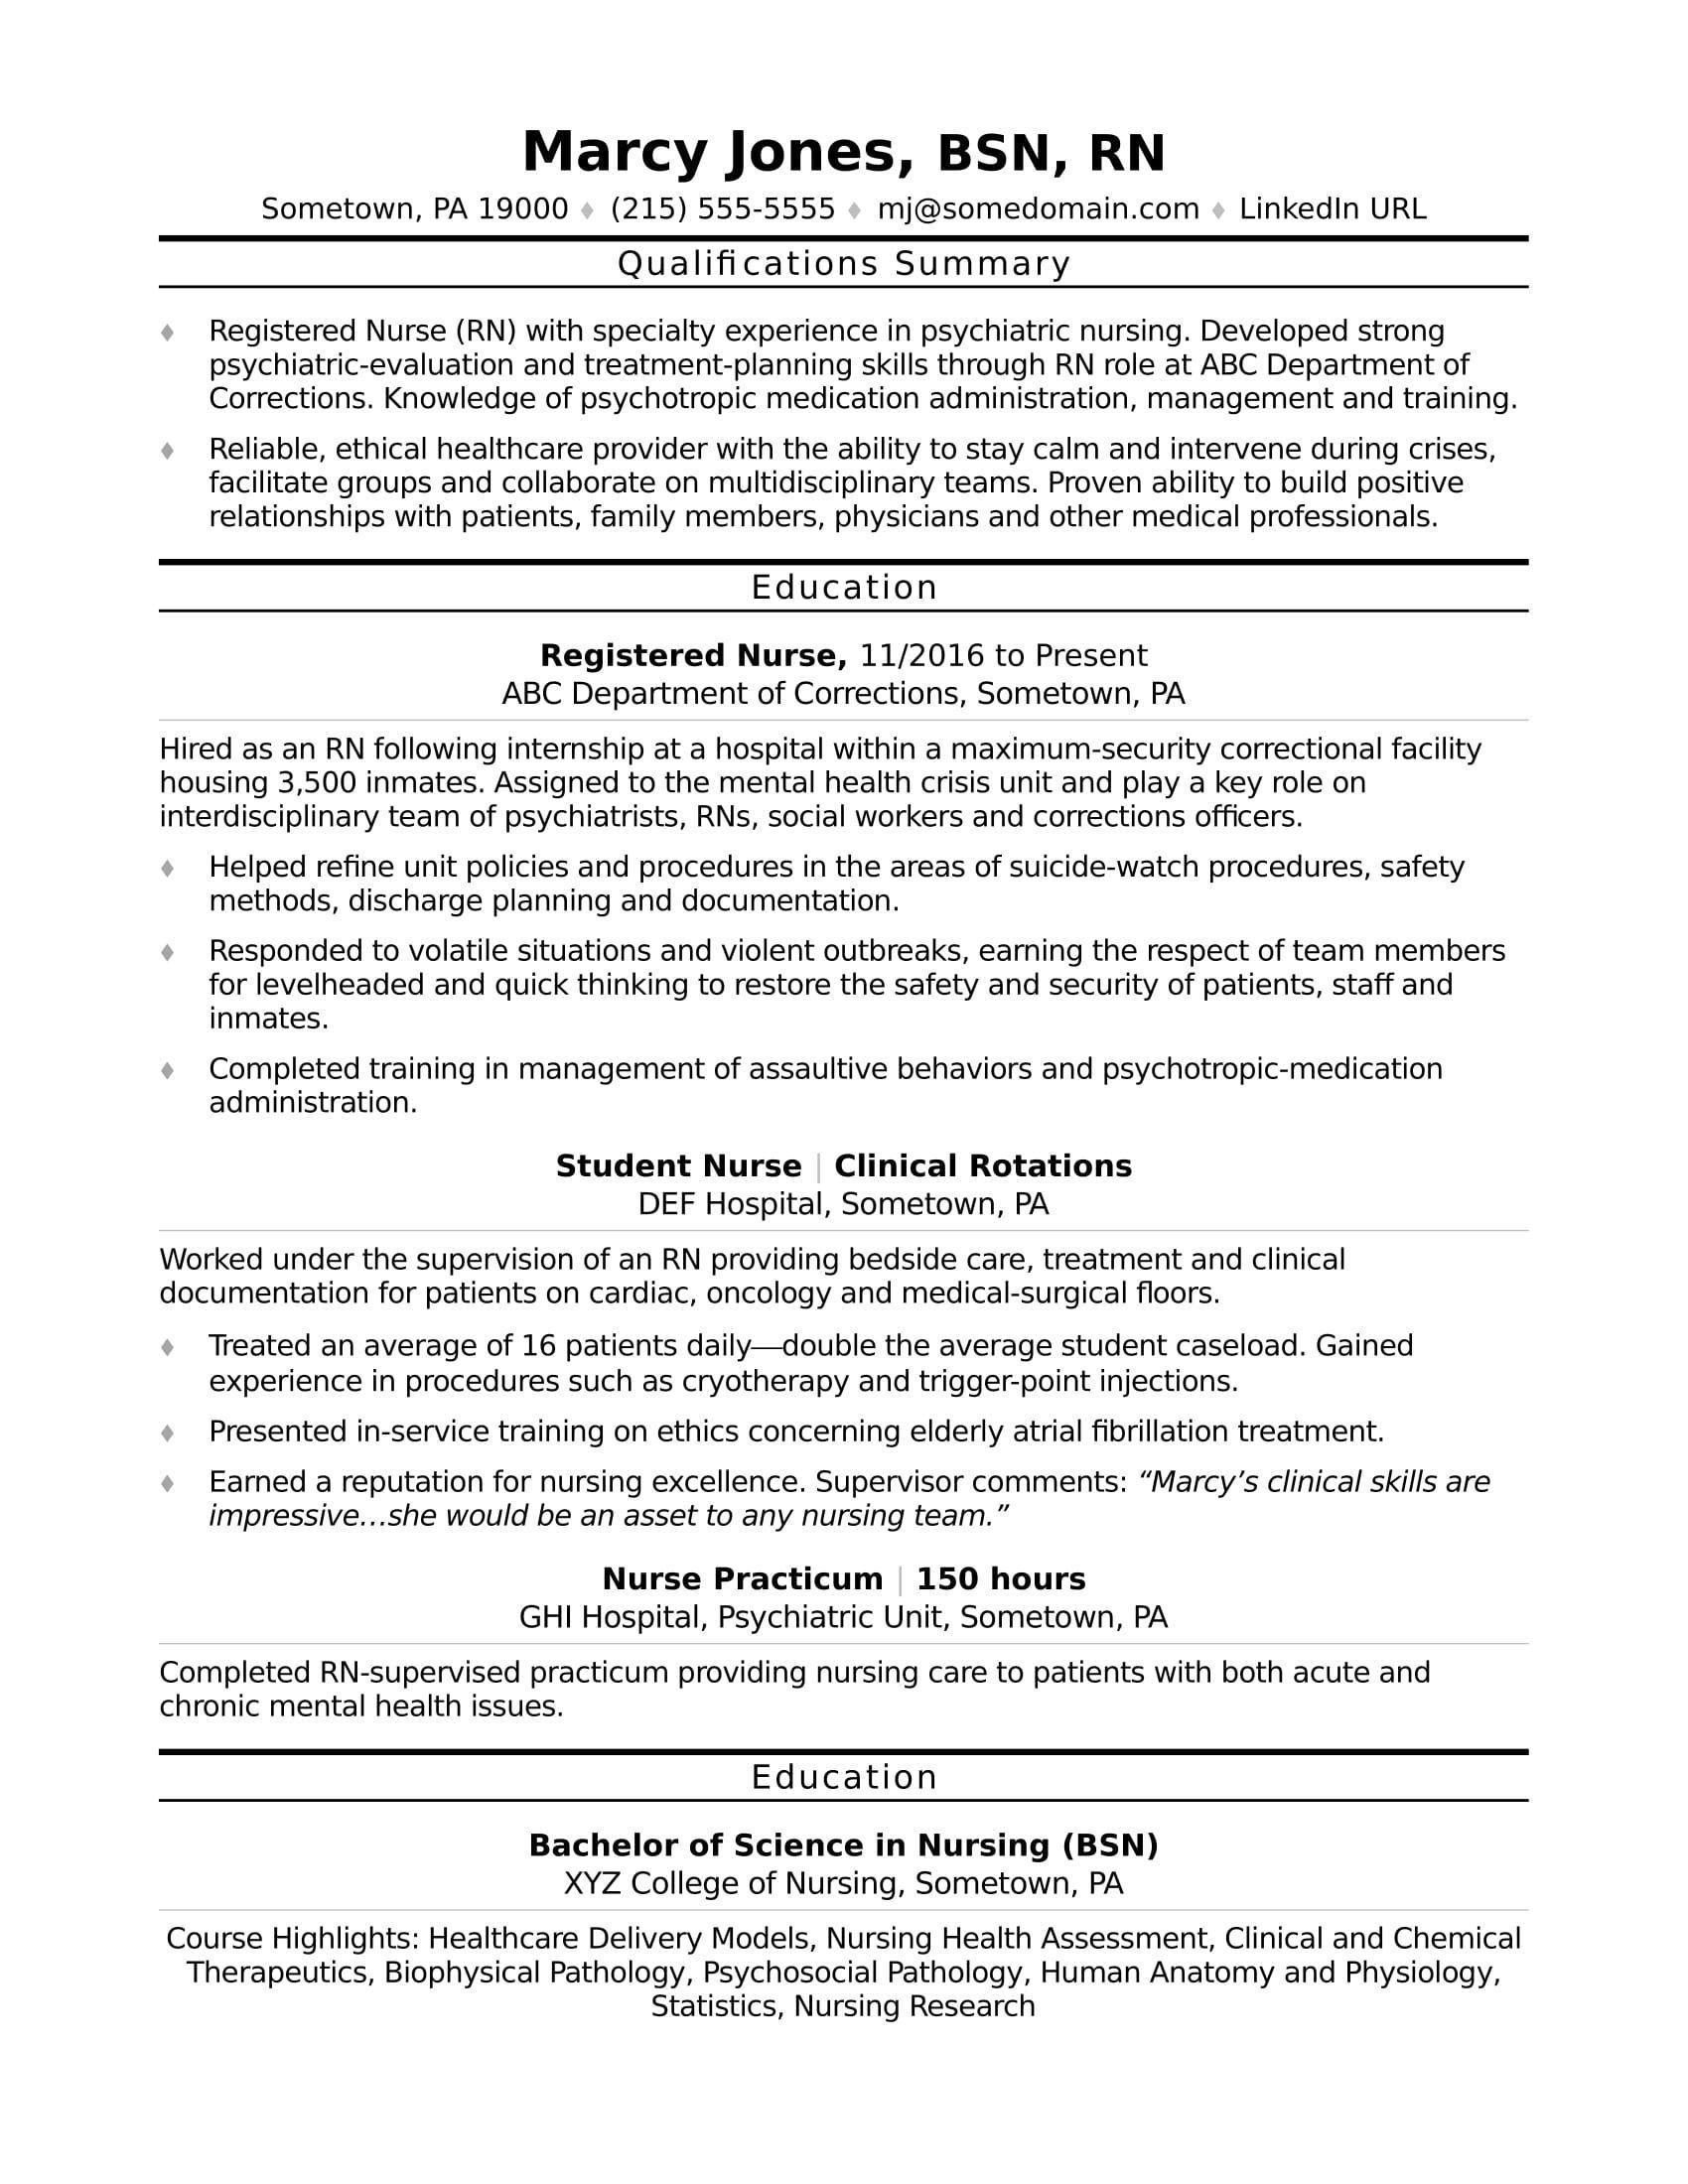 Learn how to build a powerful entrylevel nurse resume